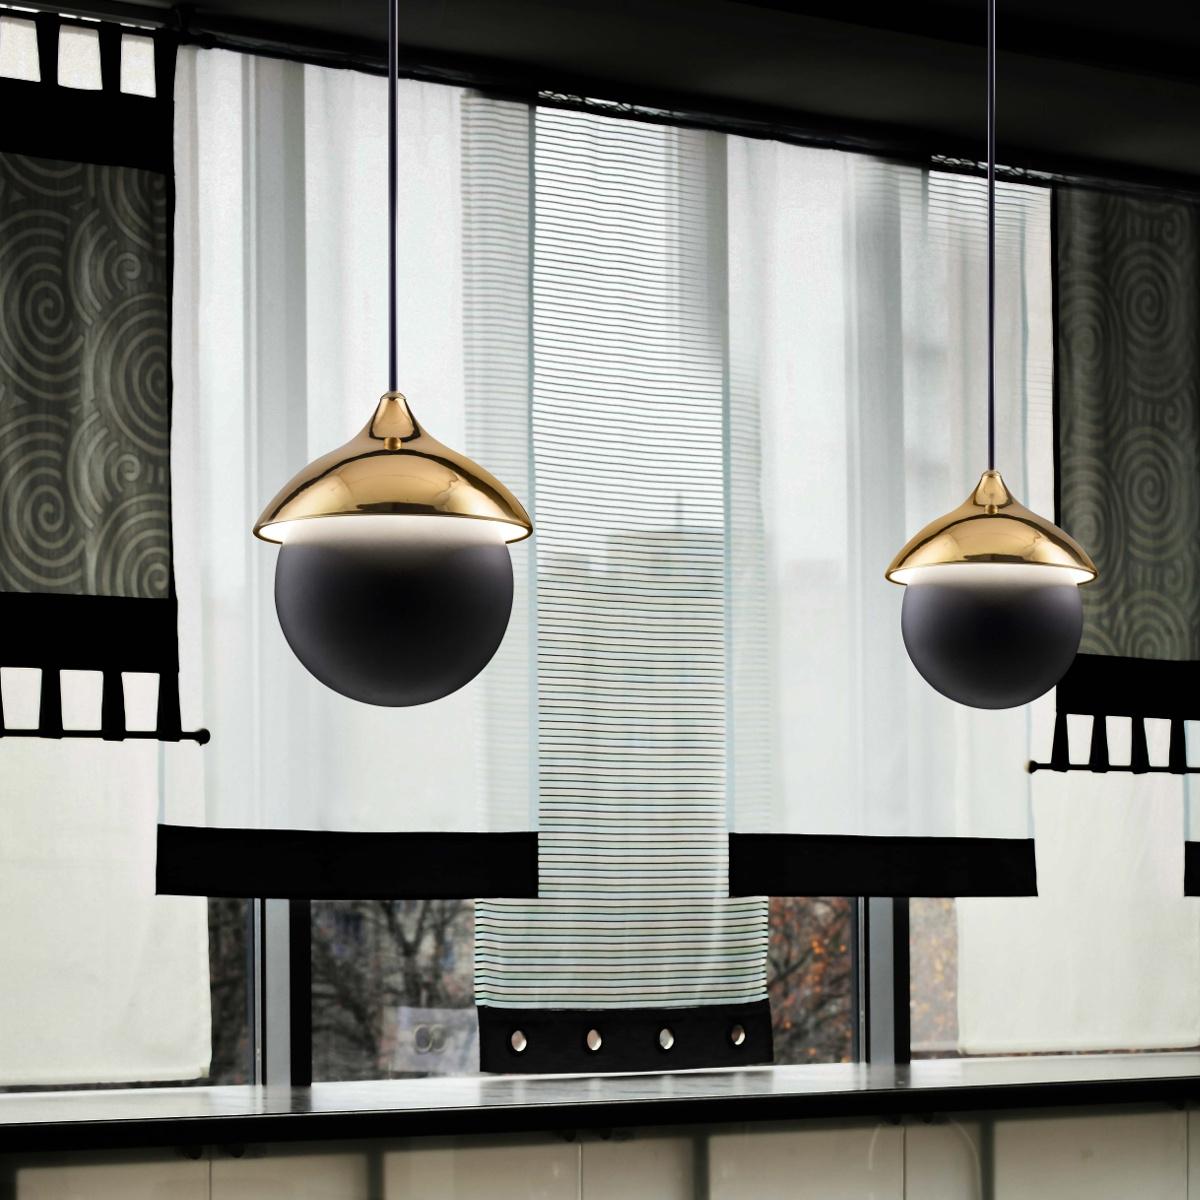 design pendelleuchte aus keramik zur passiven beleuchtung. Black Bedroom Furniture Sets. Home Design Ideas